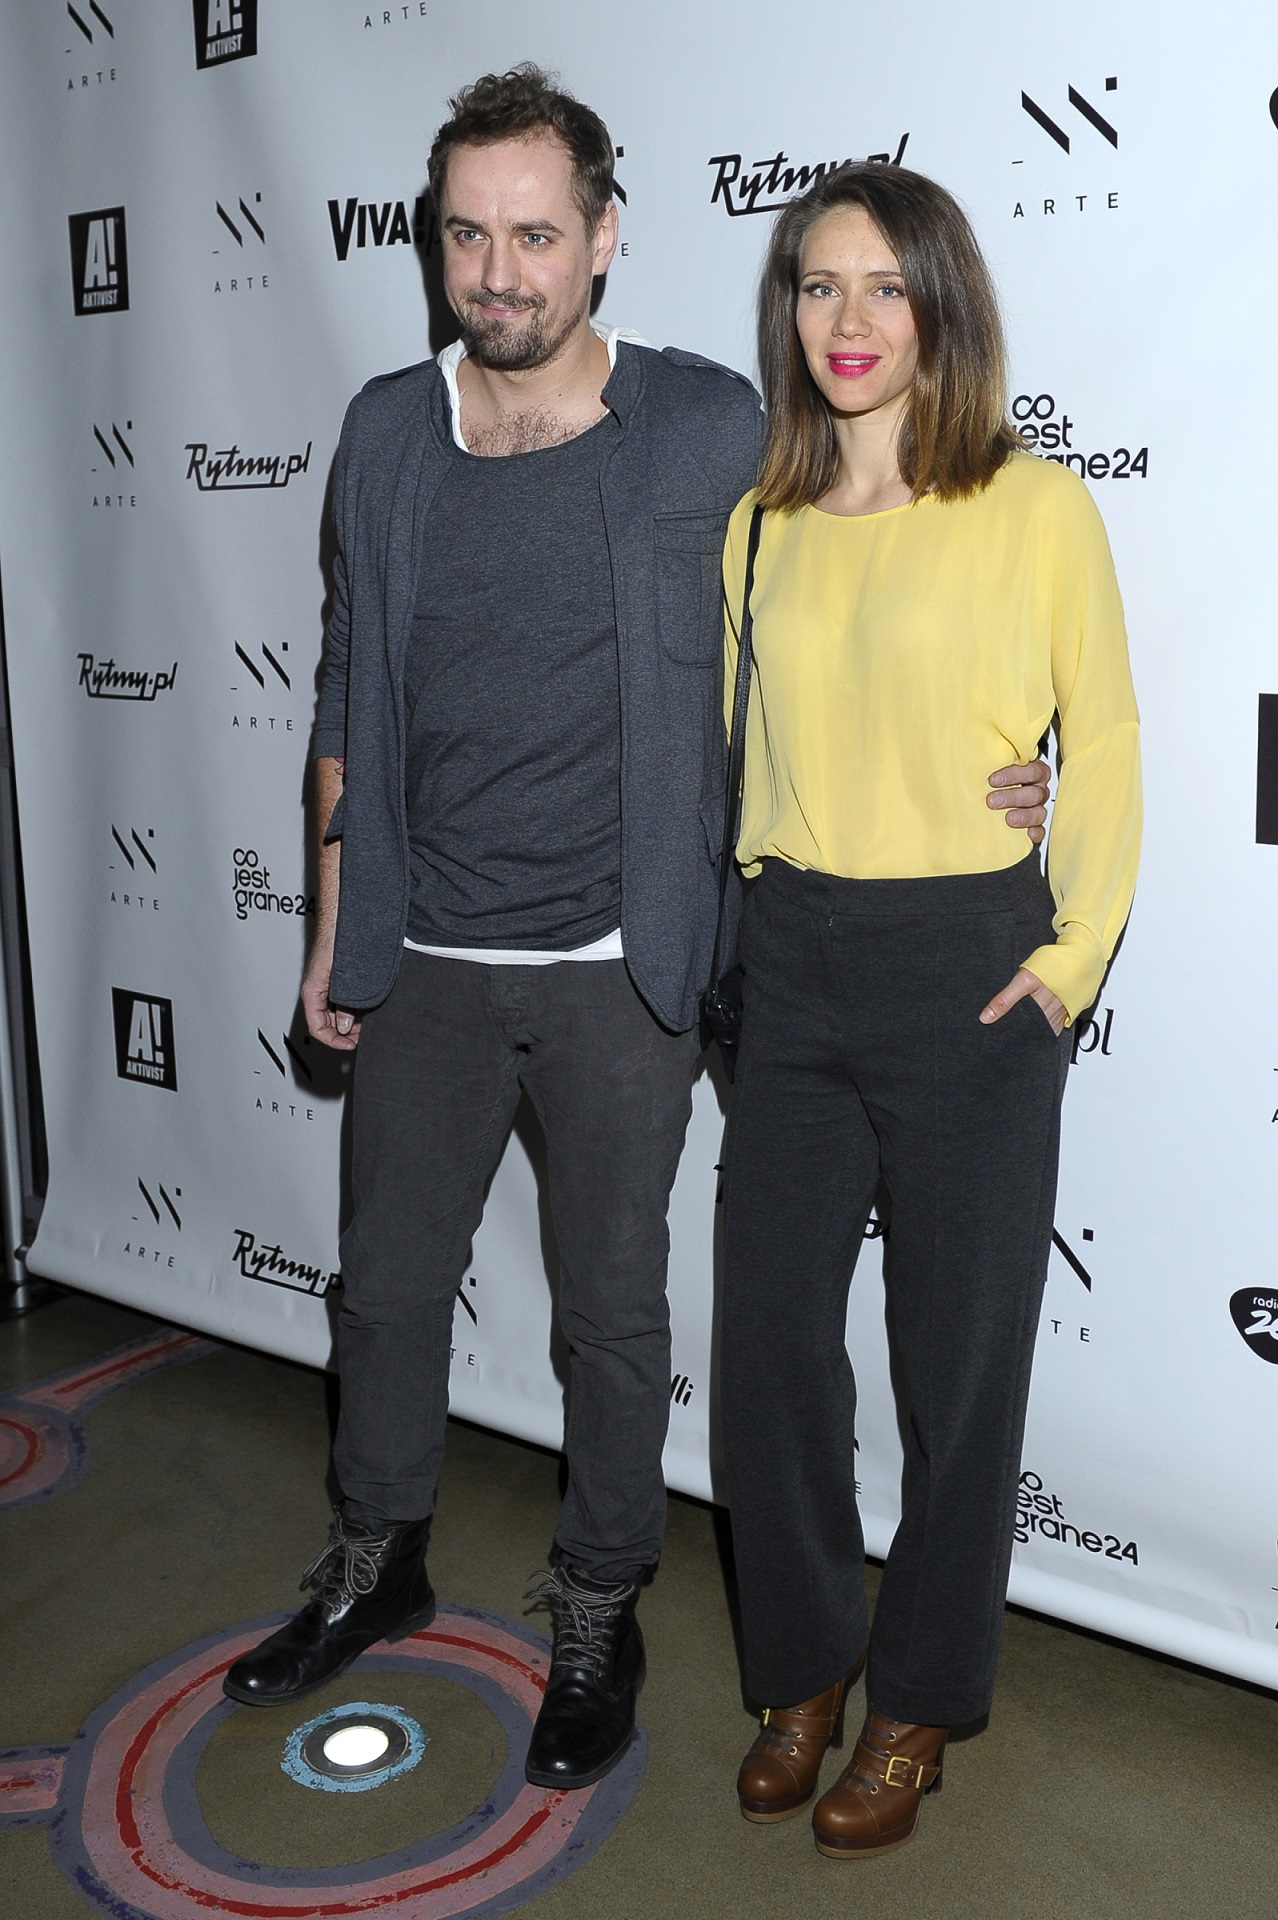 Jakubs Wons z żoną Hanną Konarowską.